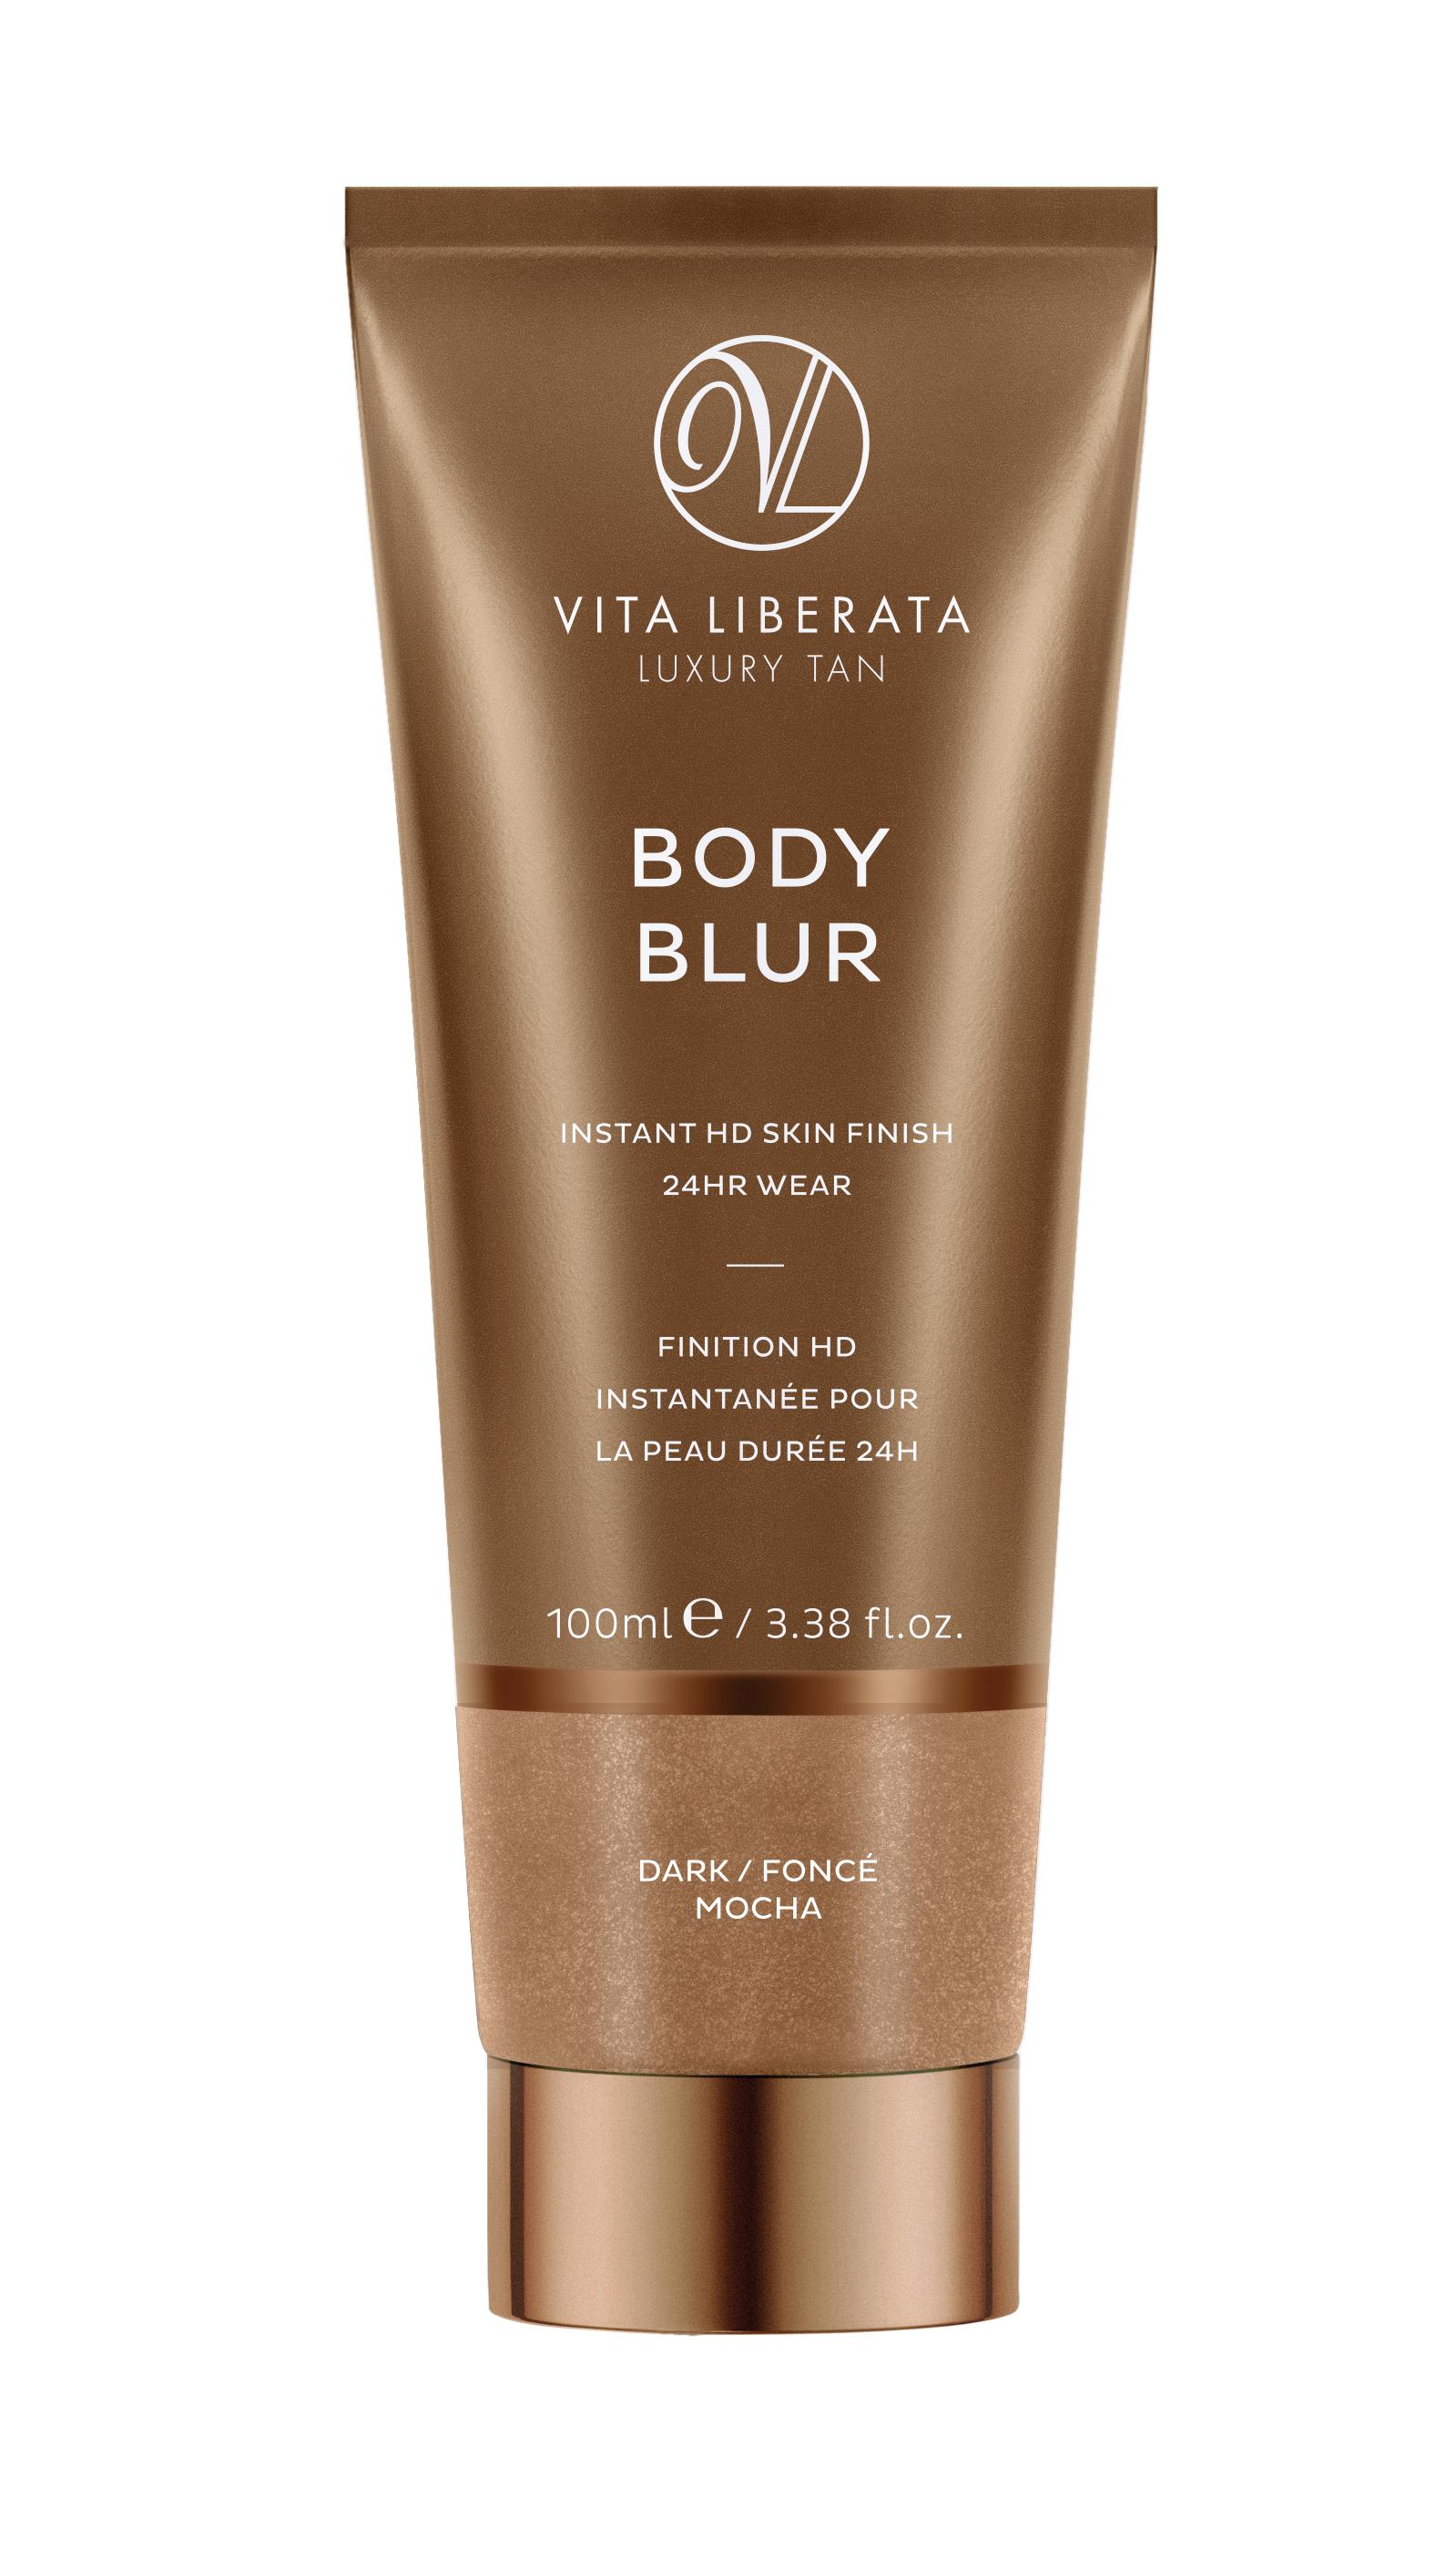 Vita Liberata Body blur, mocha/dark, 100 ml